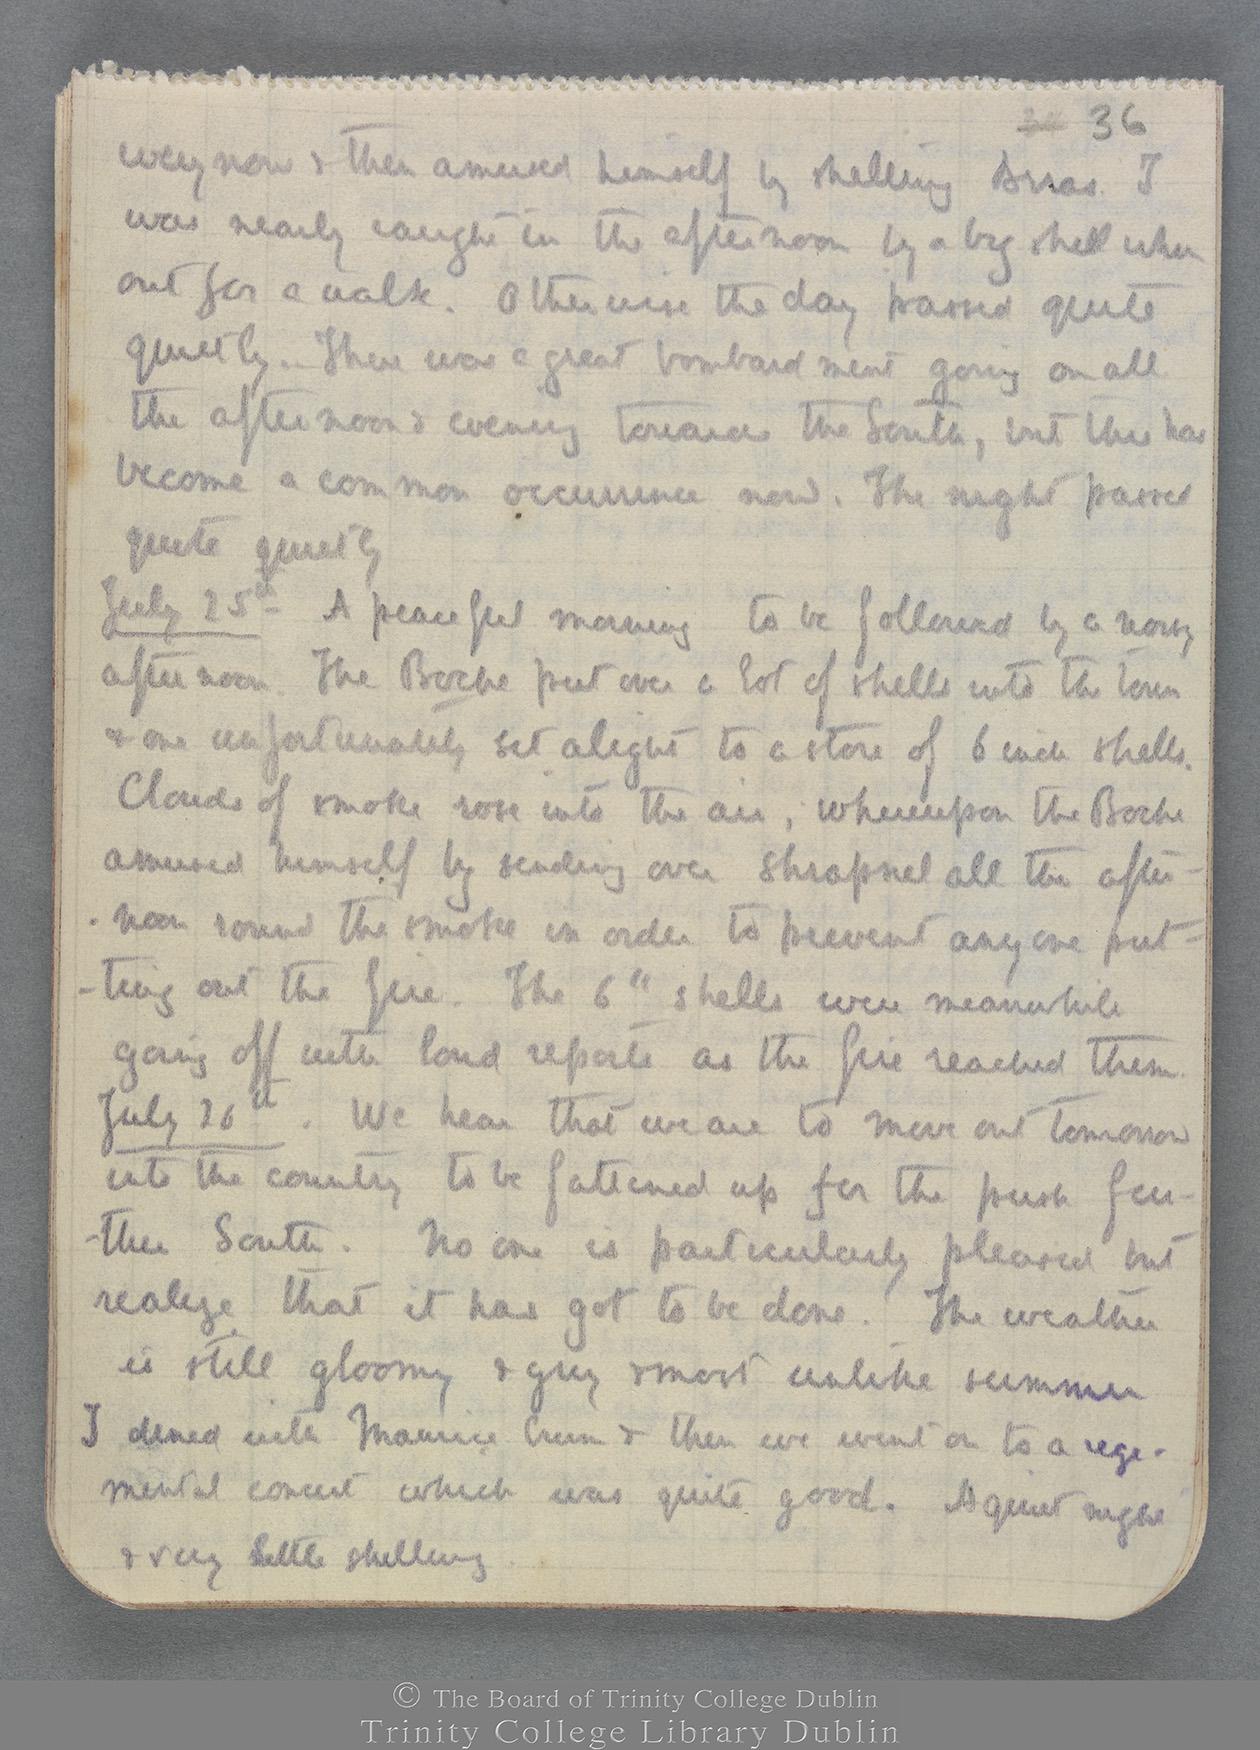 TCD MS 10821 folio 36 recto